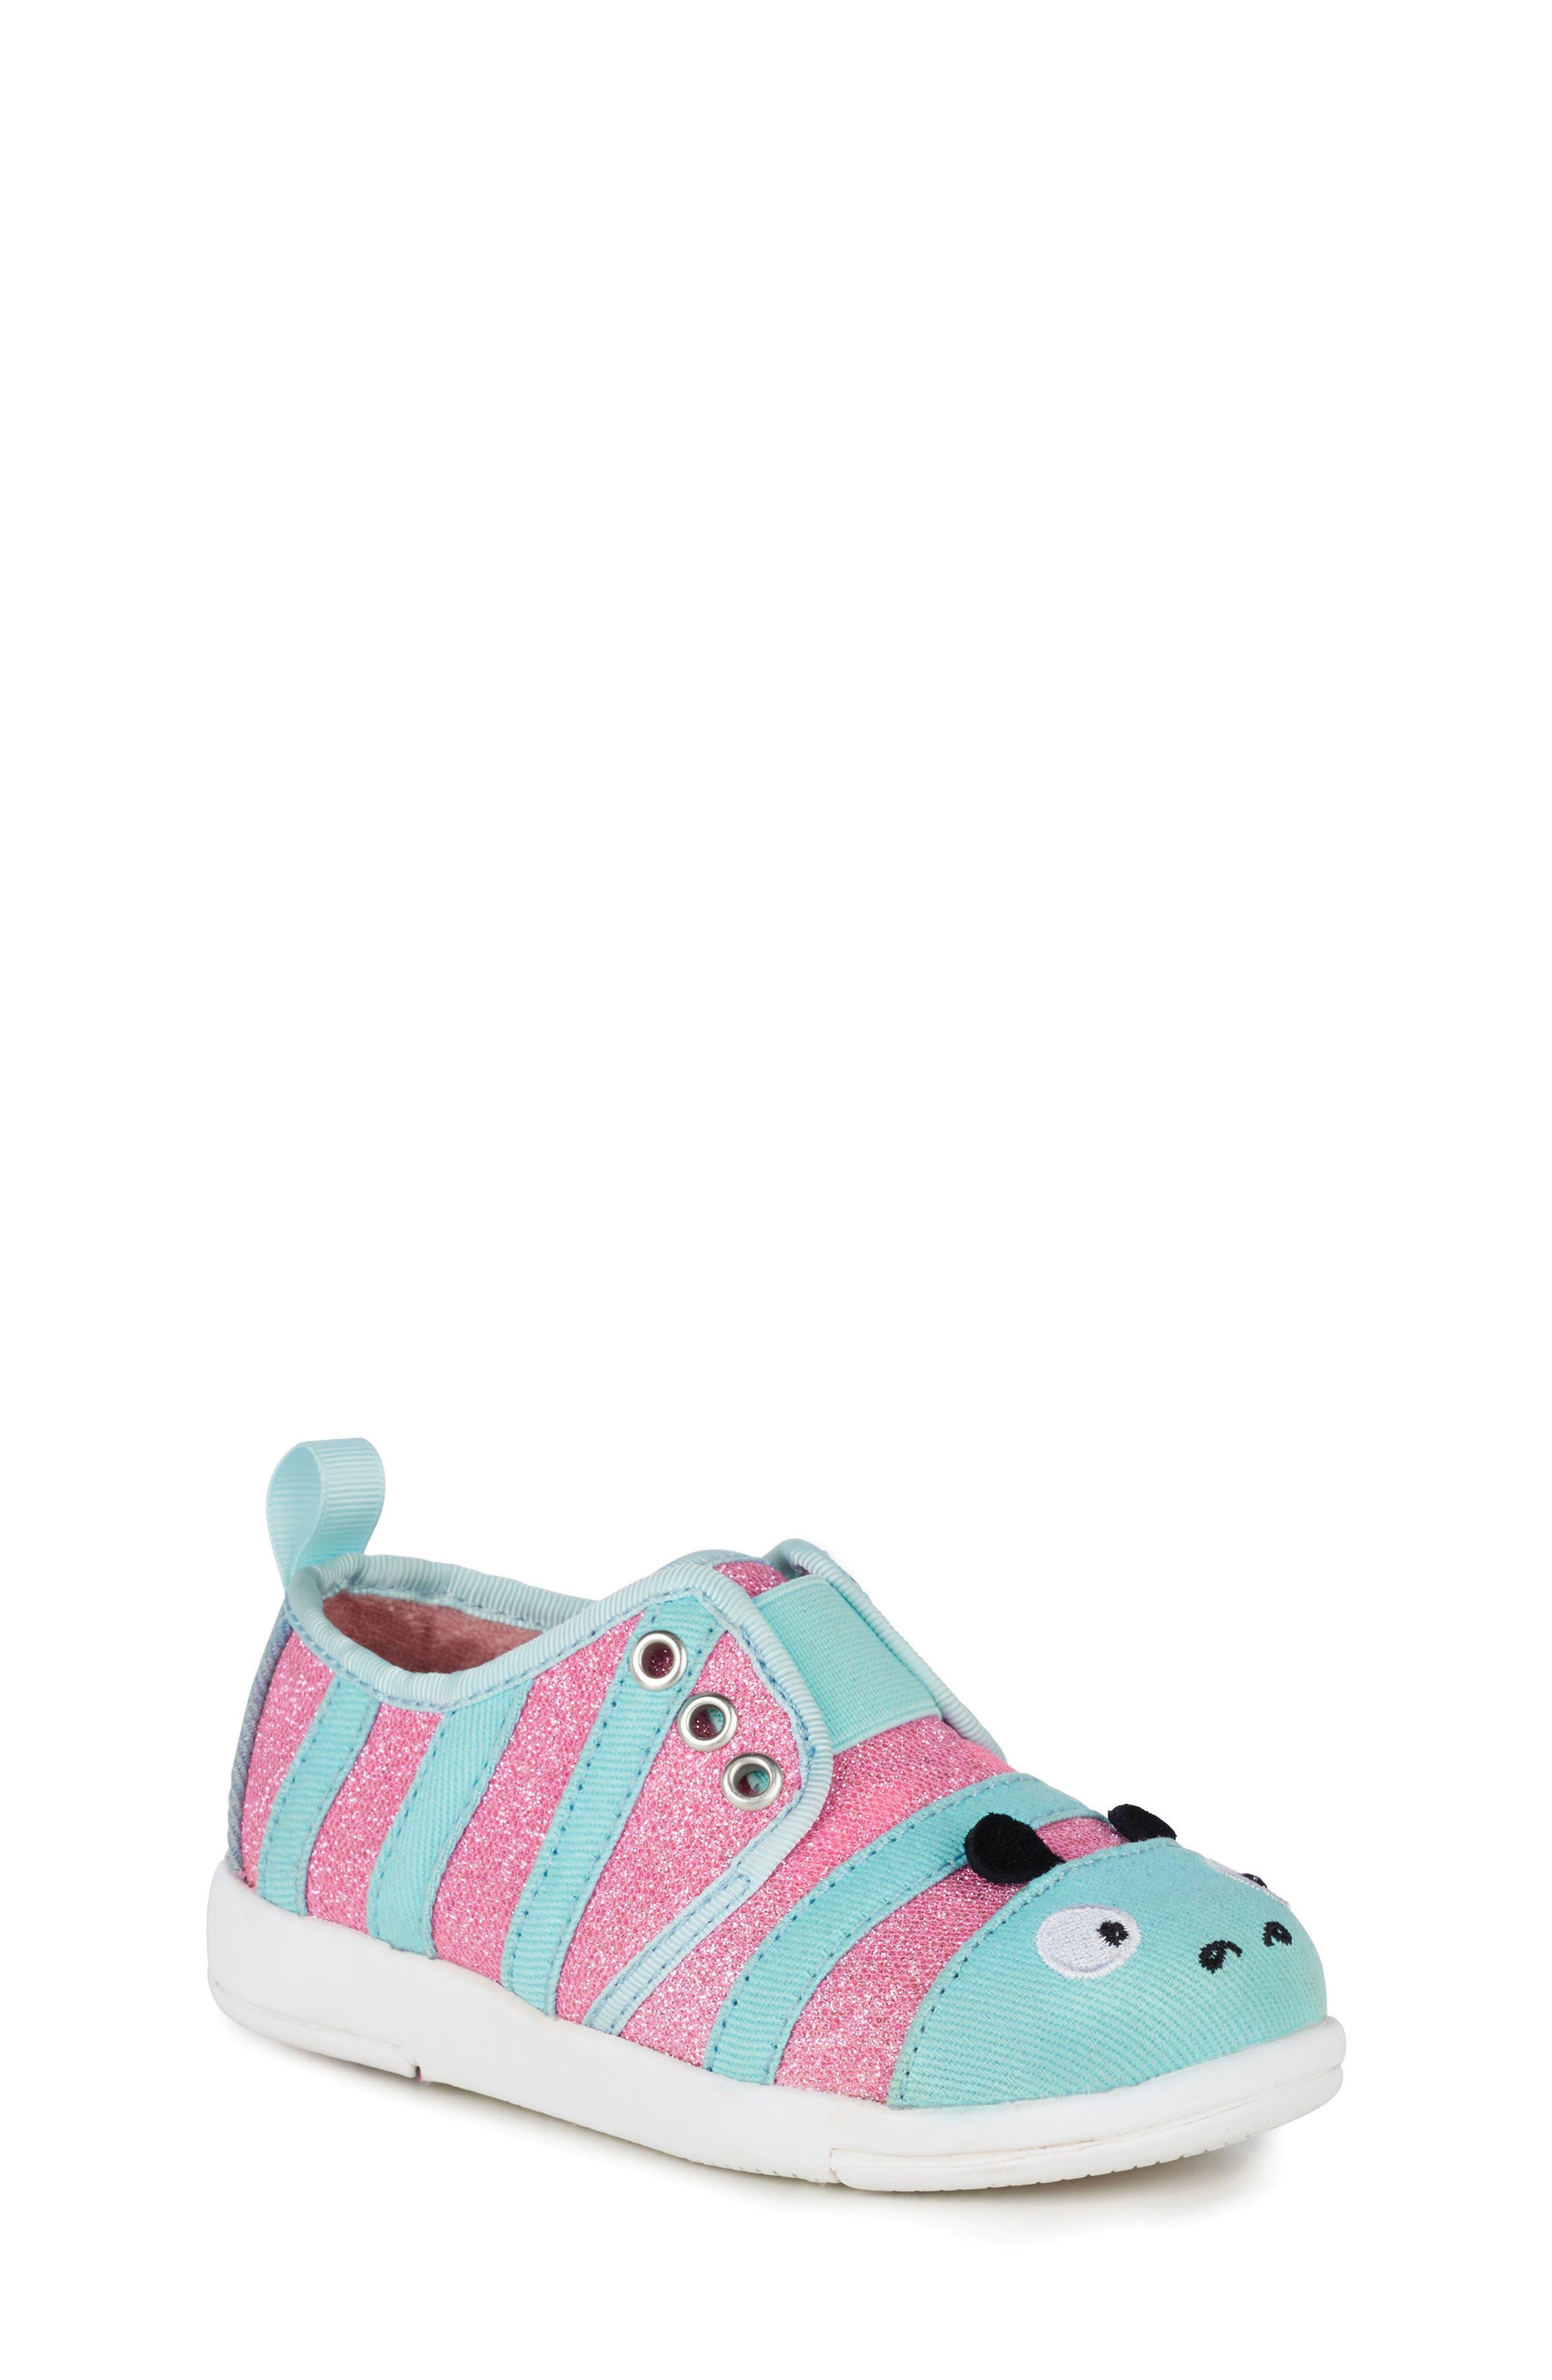 Main Image - EMU Australia Caterpillar Laceless Sneaker (Toddler, Little Kid & Big Kid)